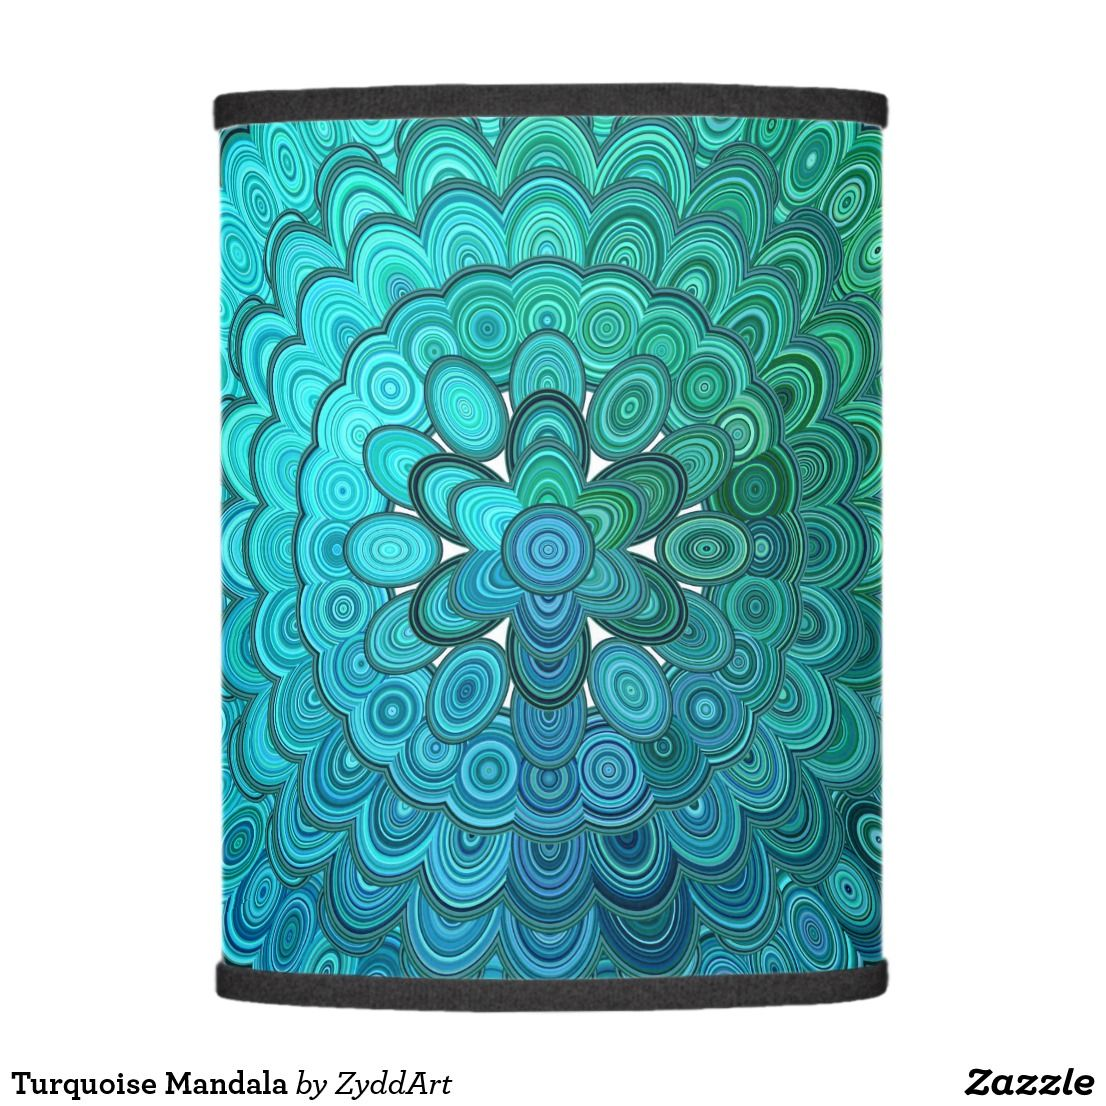 Botanical gift Mandala Gift Birthday gift for friend Rainbow Mandala Coasters Mandala gift idea Gift idea Sister Birthday gift idea